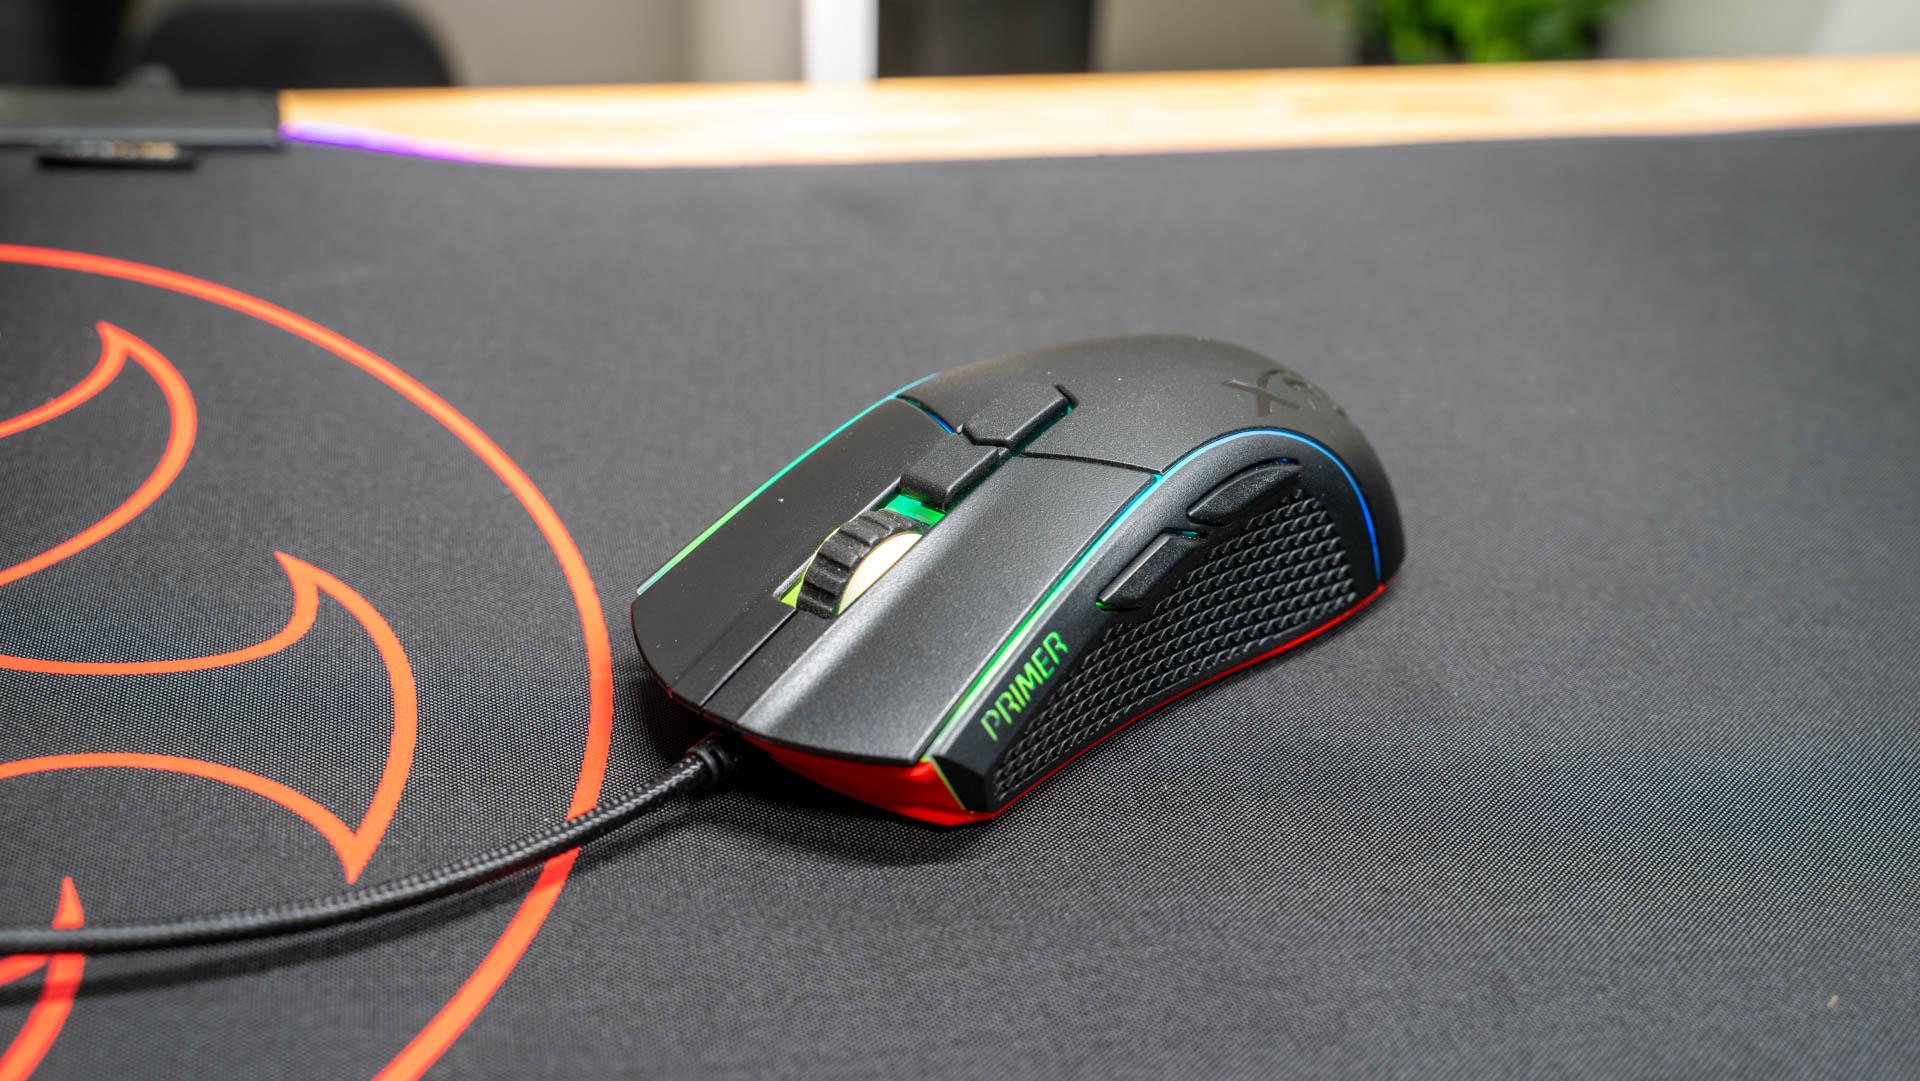 Die XPG PRIMER Gaming-Maus im Test